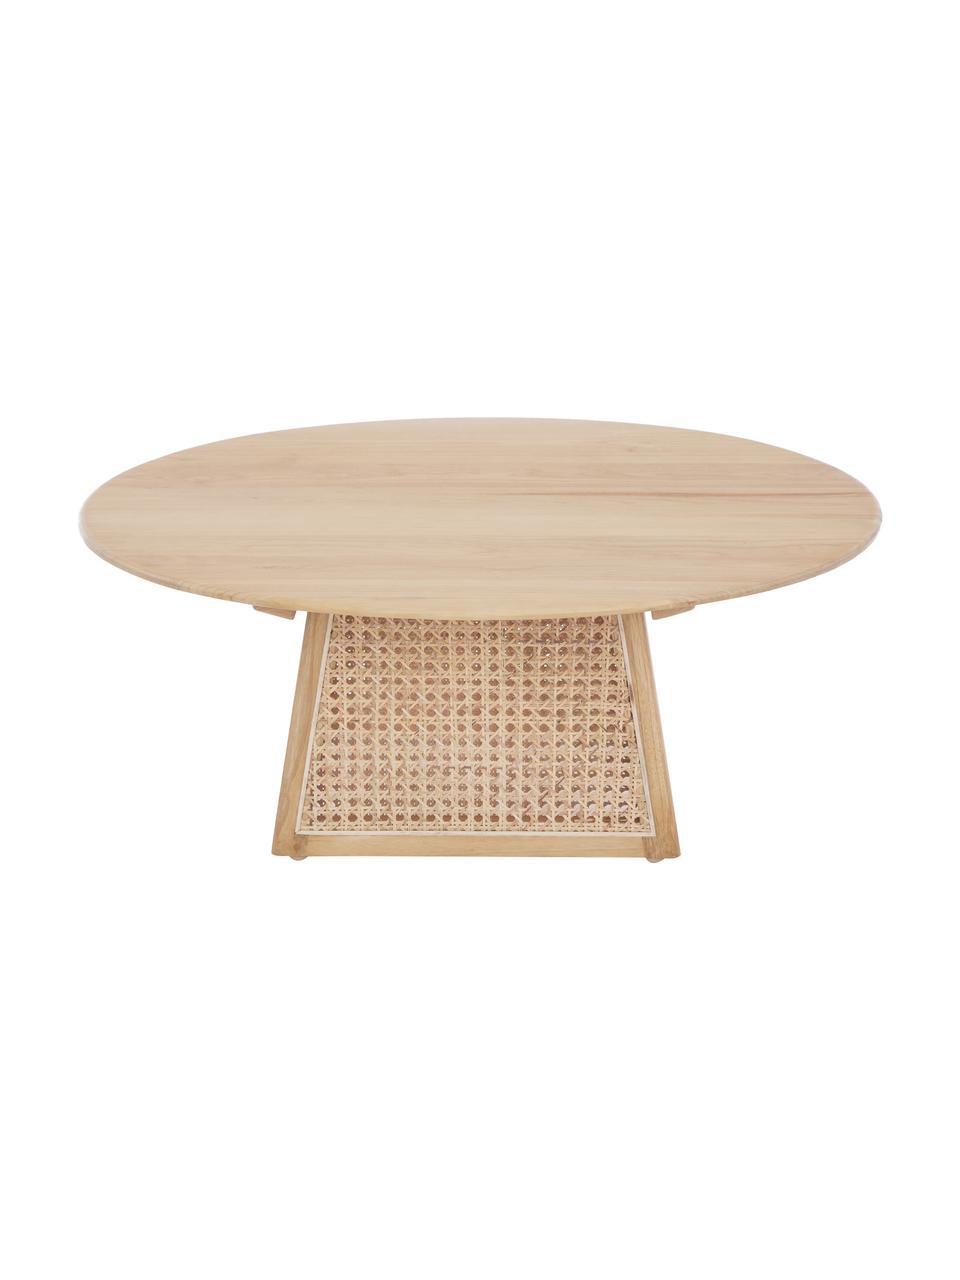 Ronde salontafel Retro met Weens vlechtwerk, Sunkai hout, Ø 80 x H 30 cm